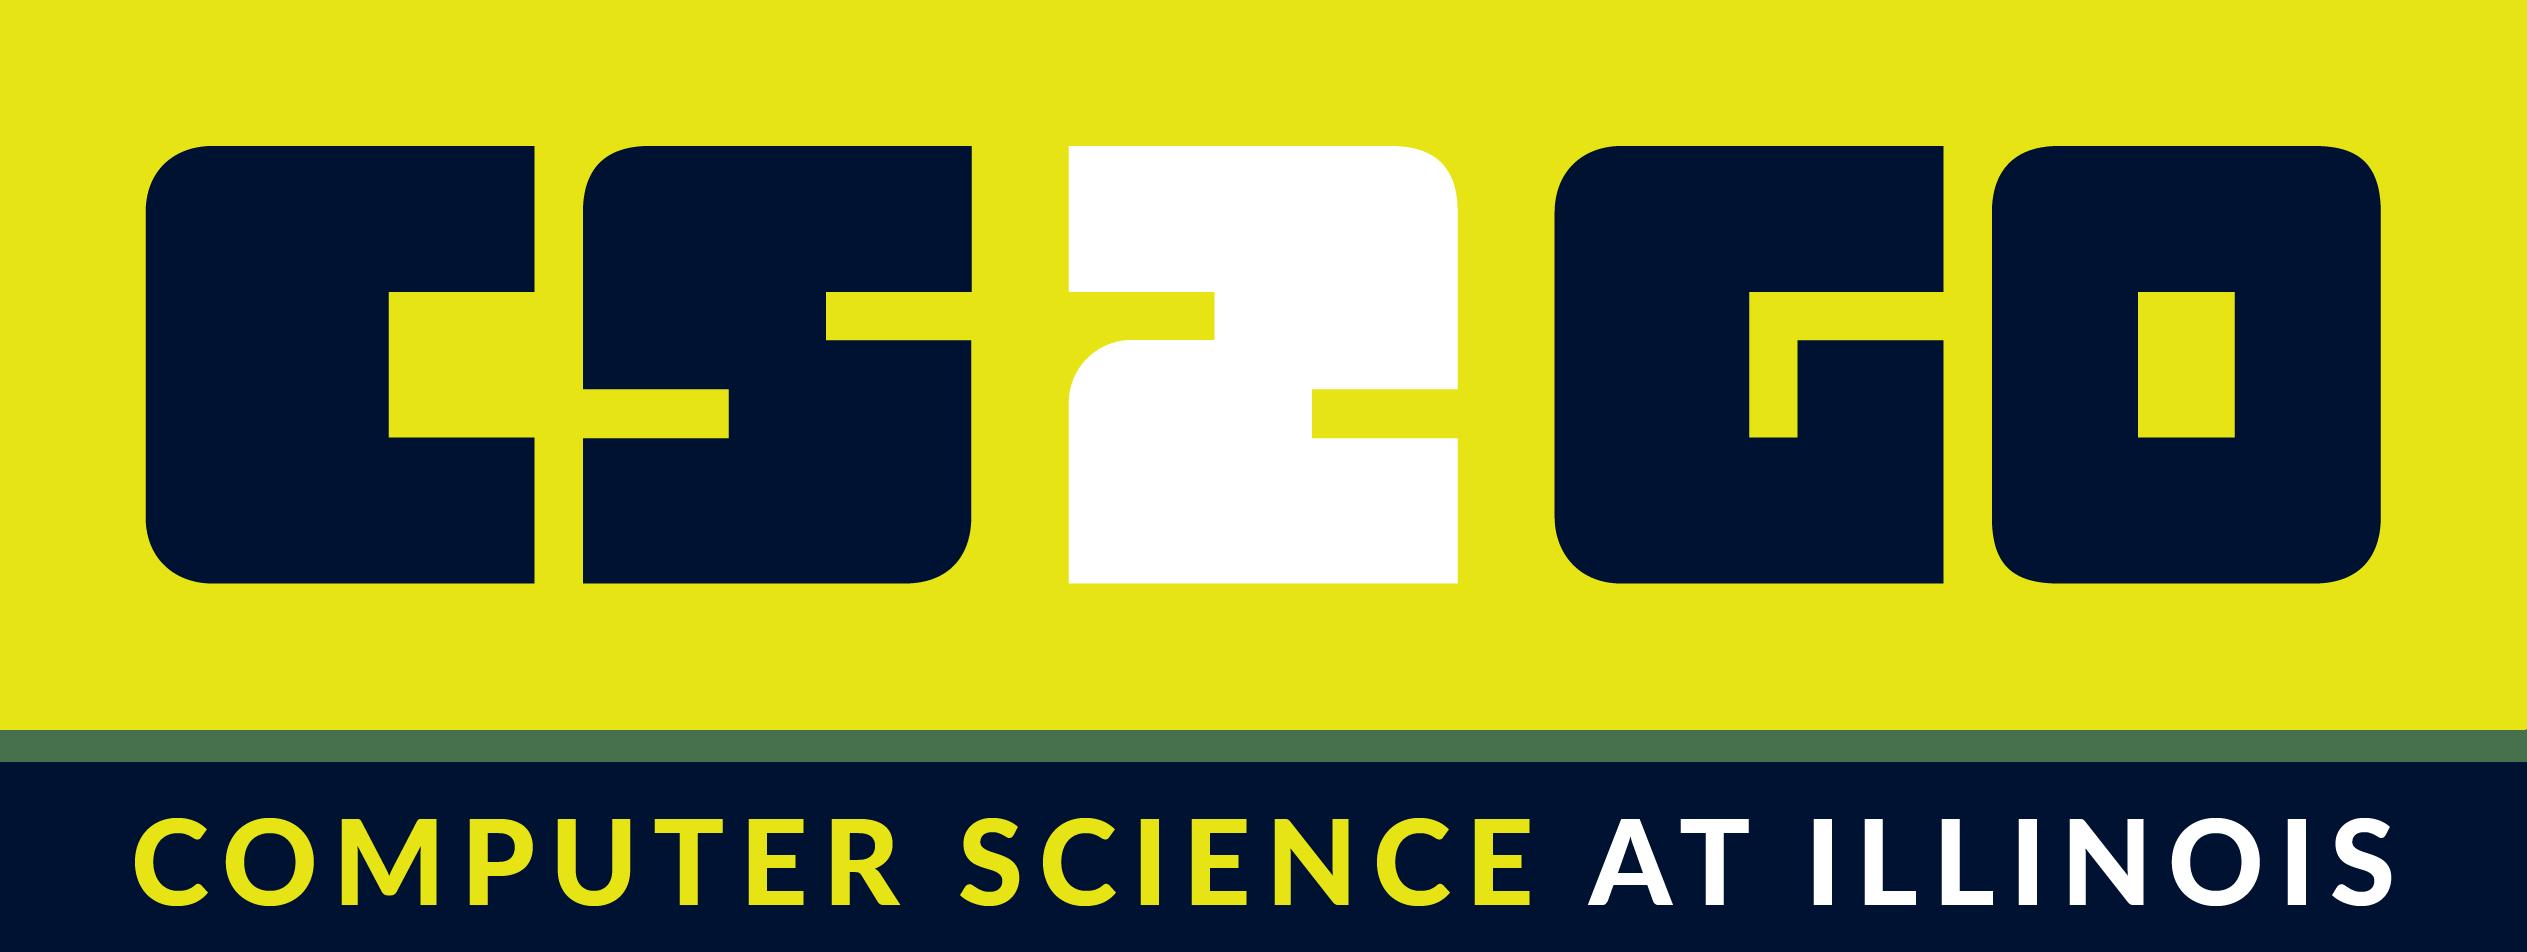 Illinois Computer Science - CS2GO